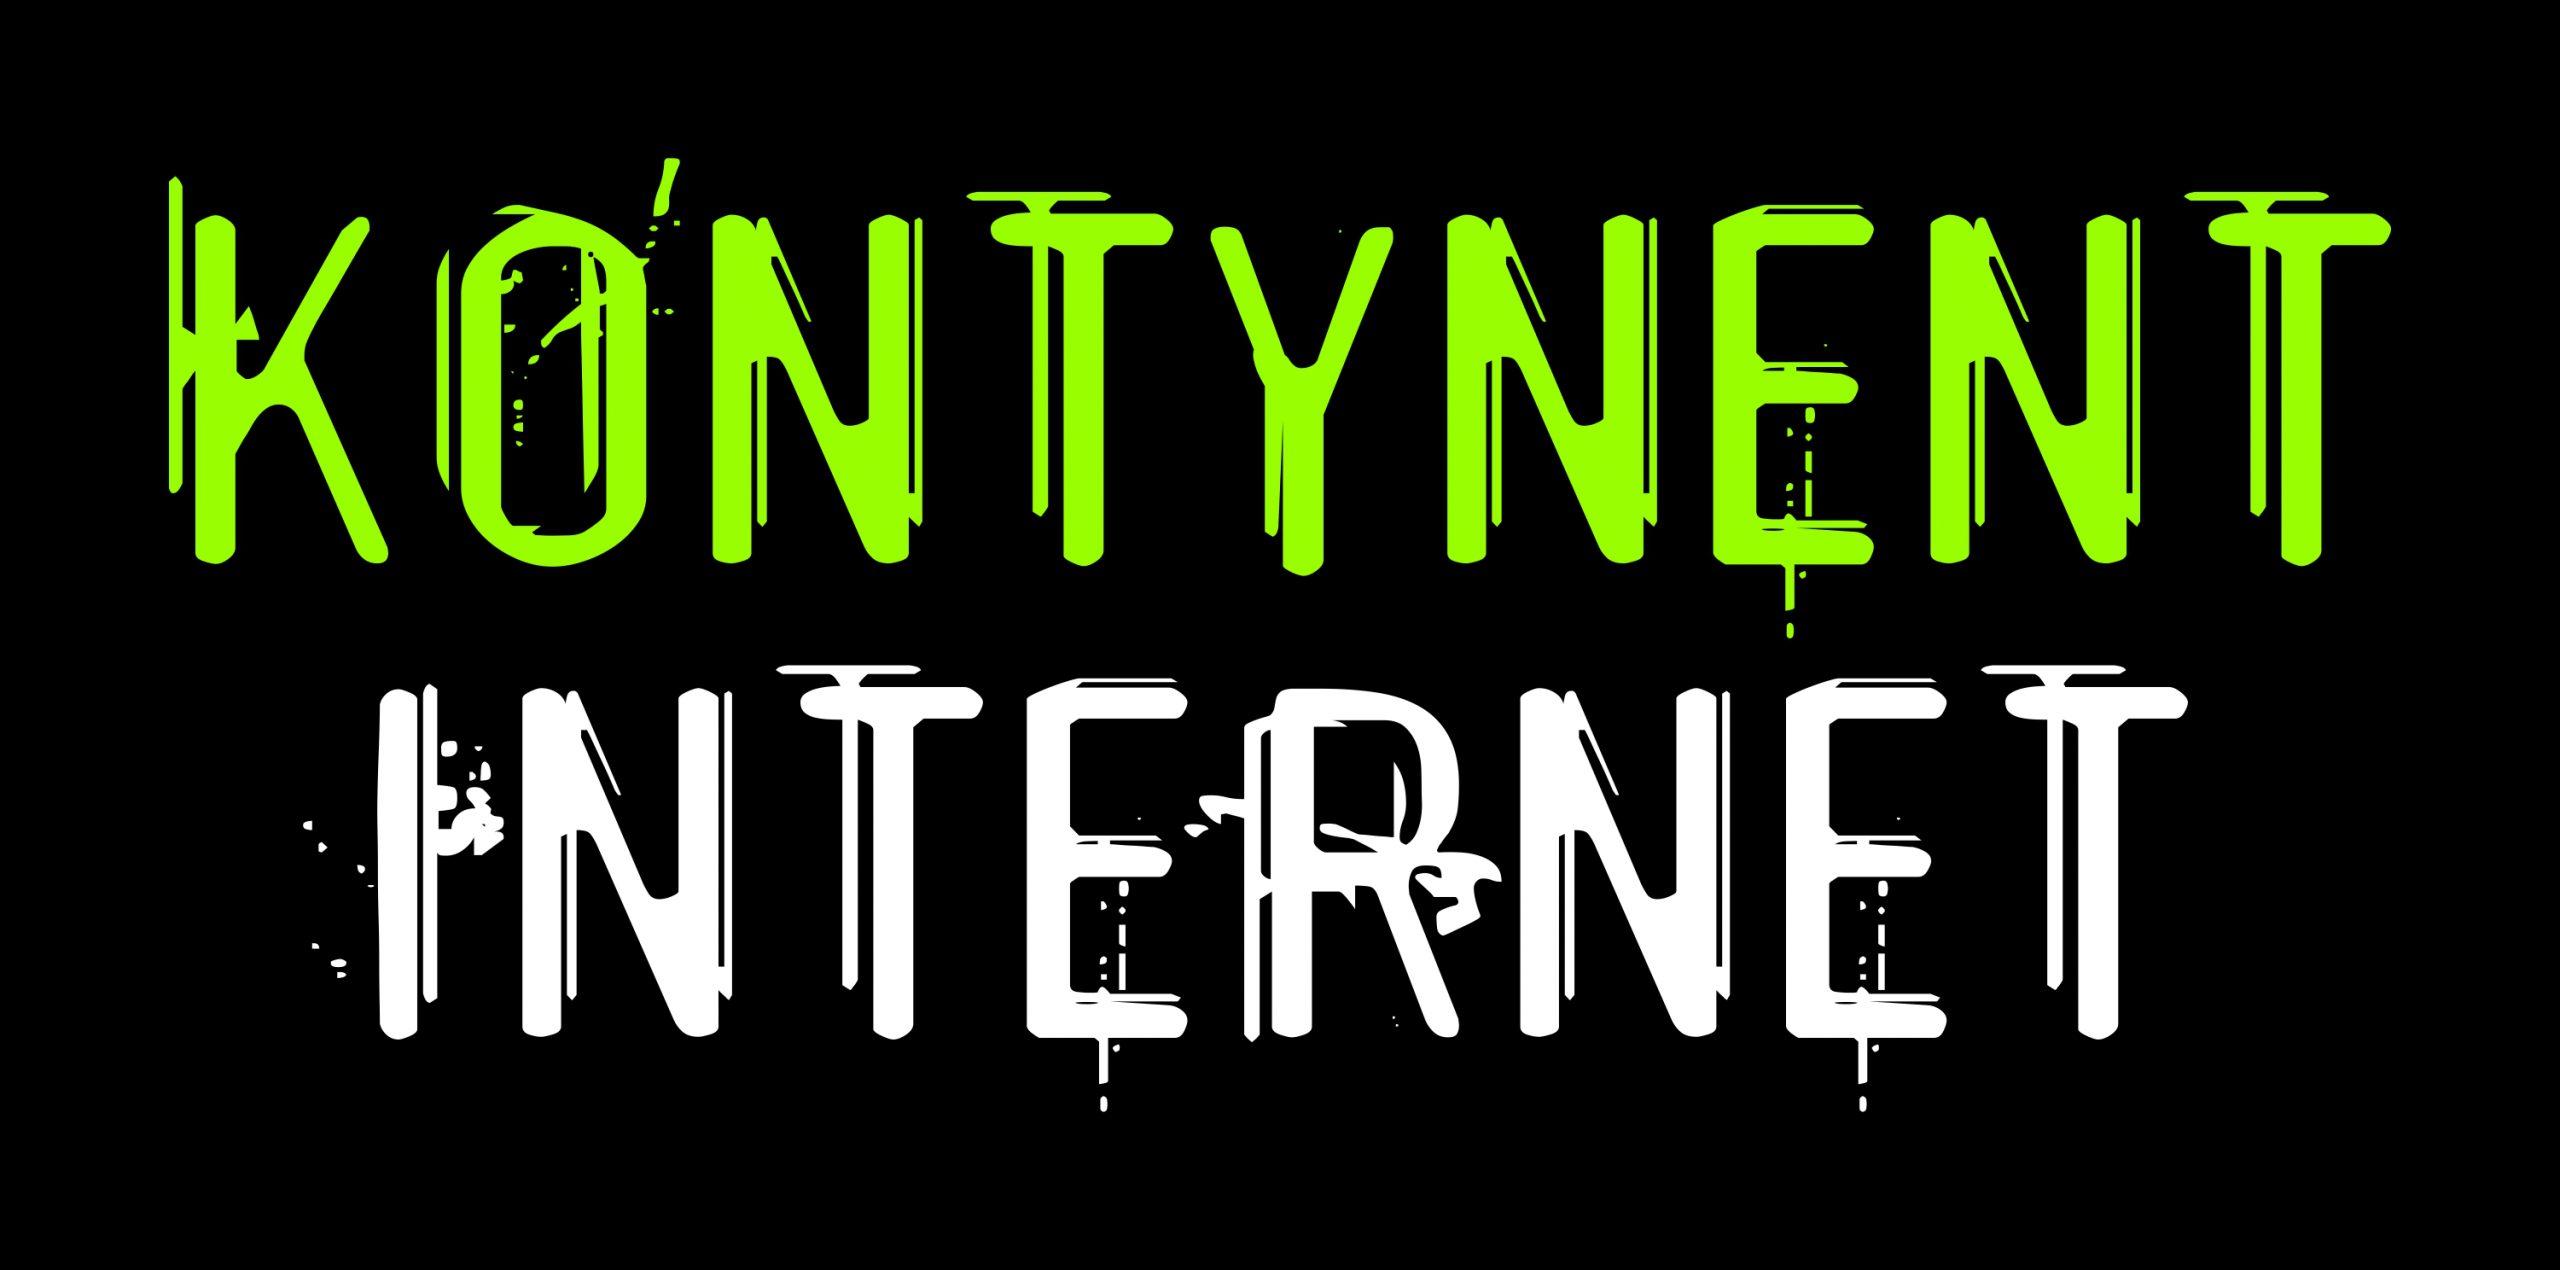 logo KONTYNENT INTERNET